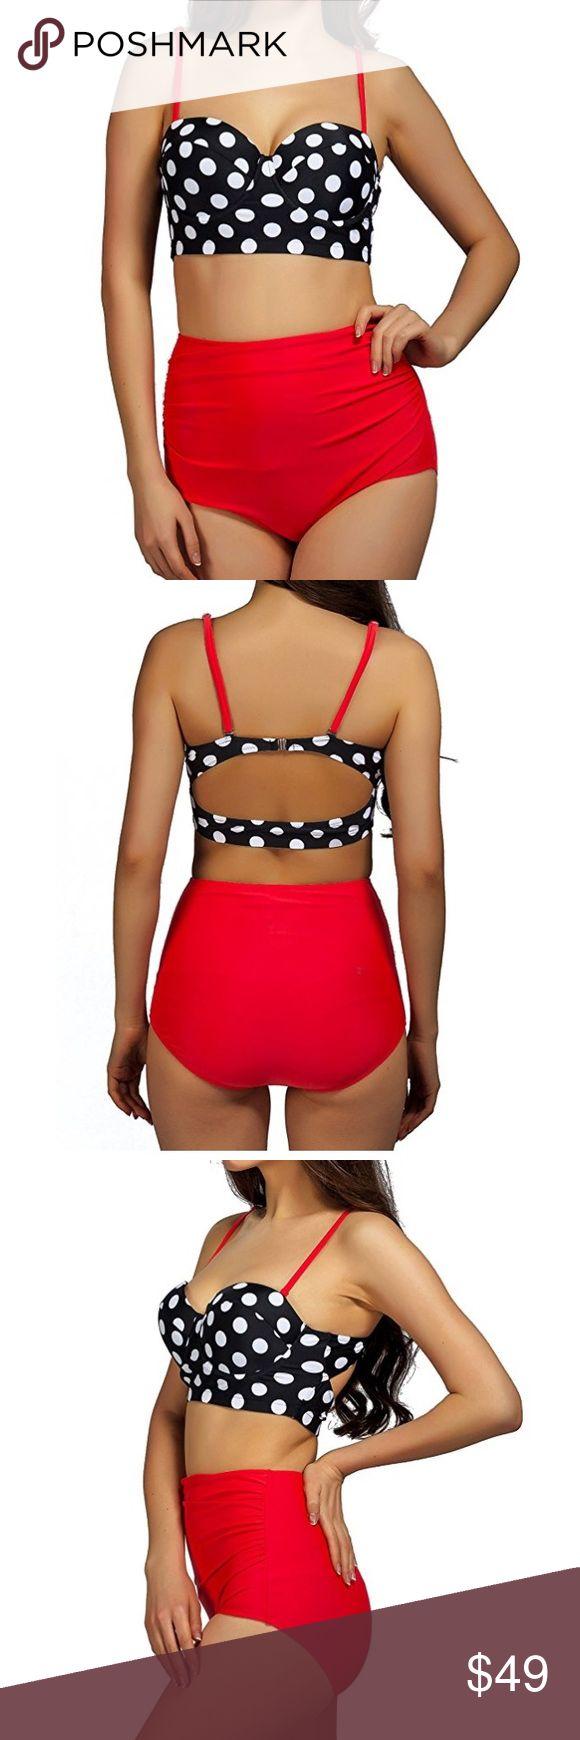 🆕 High Waisted 2 Piece Retro Polka Dot bikini 👙 High Waisted Two Piece Swimsuits for Women Push Up Bathing Suits Bikini Polka Dot Swim Bikinis